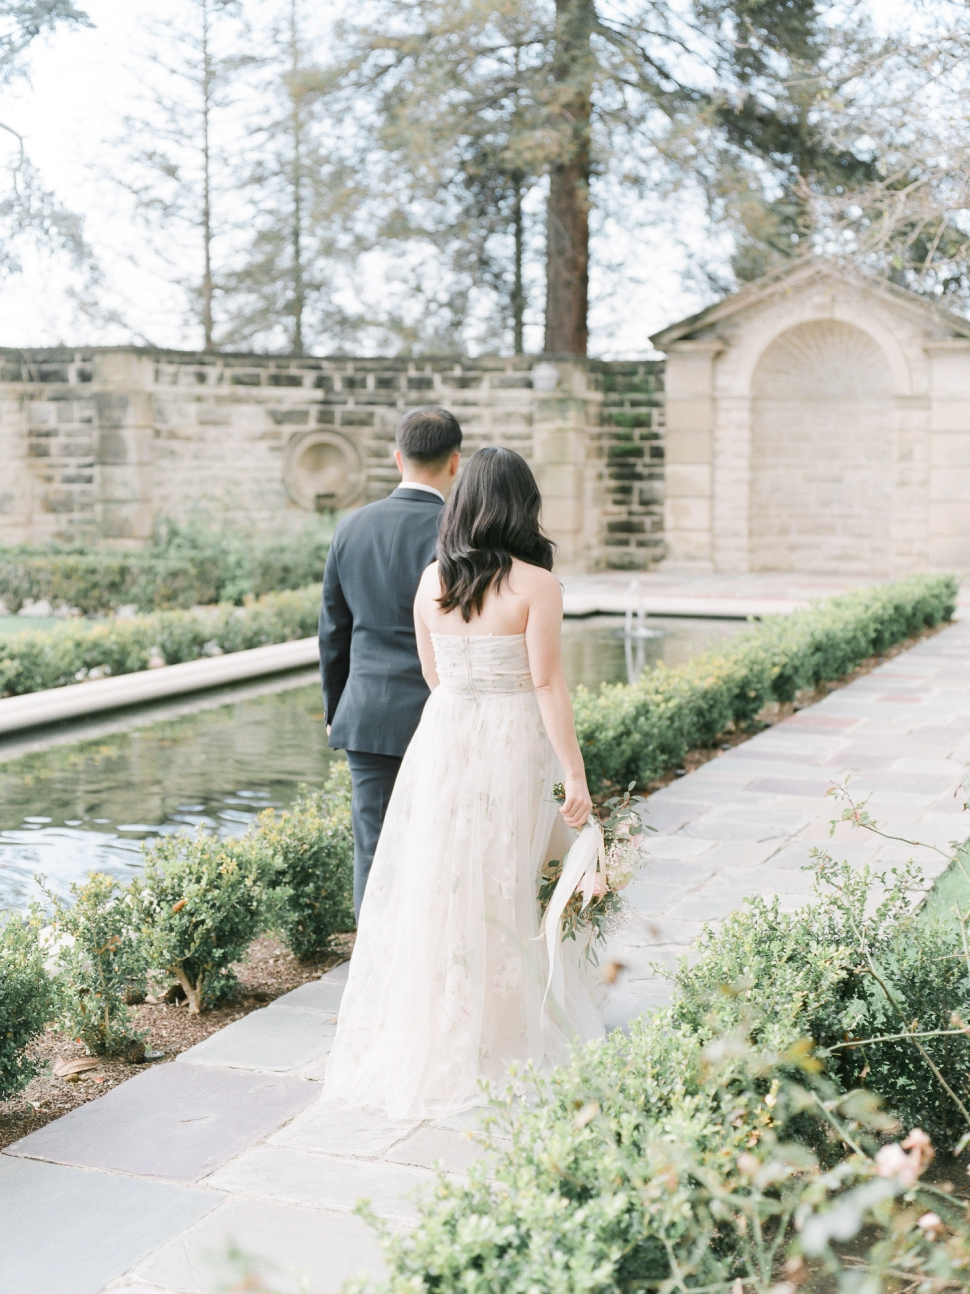 Southern-California-Wedding-Photographer-Cassi-Claire-Greystone-Mansion-Beverly-Hills-CA-wedding_05.jpg